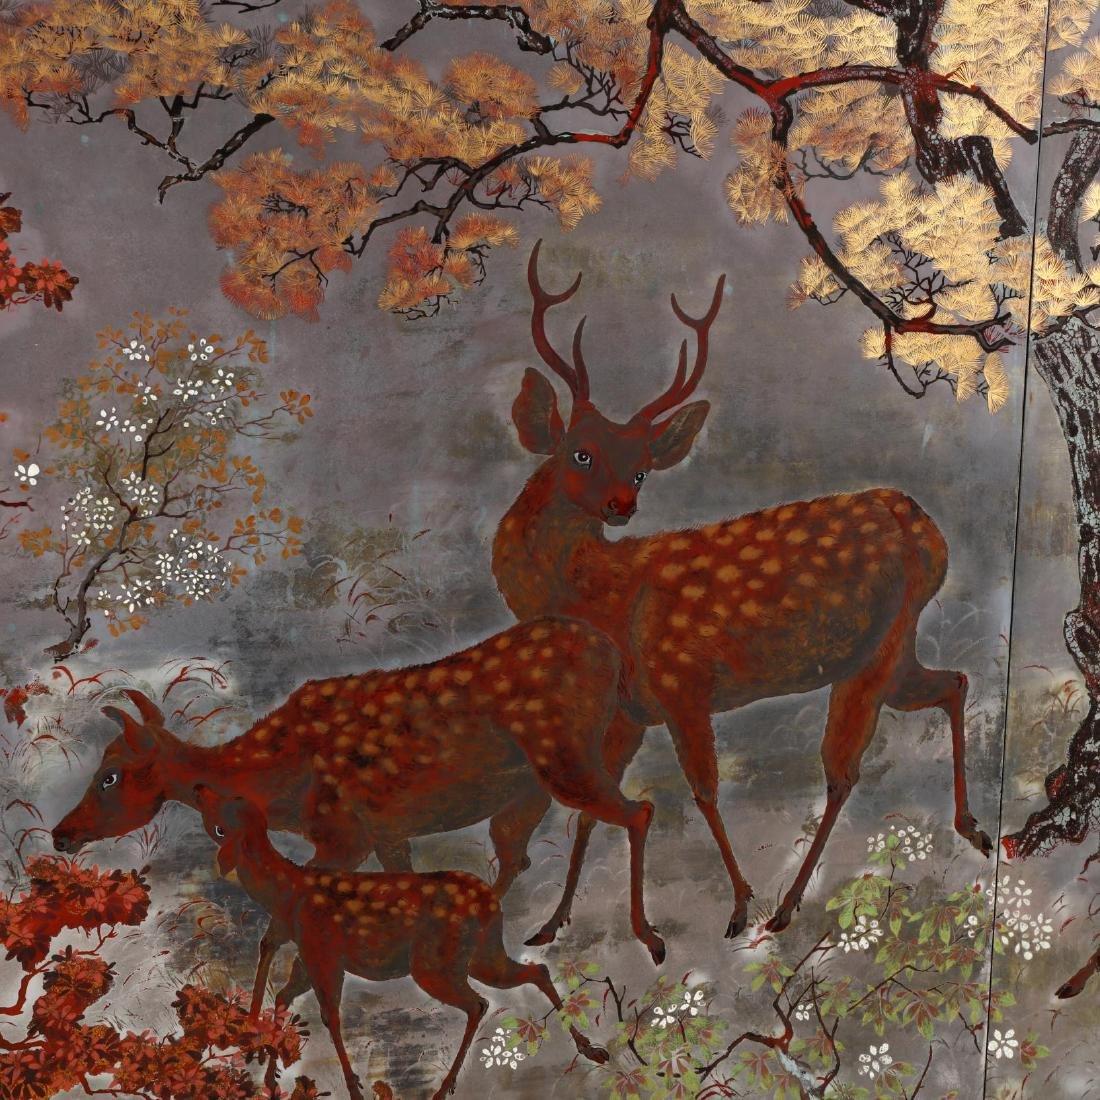 Tran Dzu Hong (Vietnamese, 1922-2002), A Painting of - 3